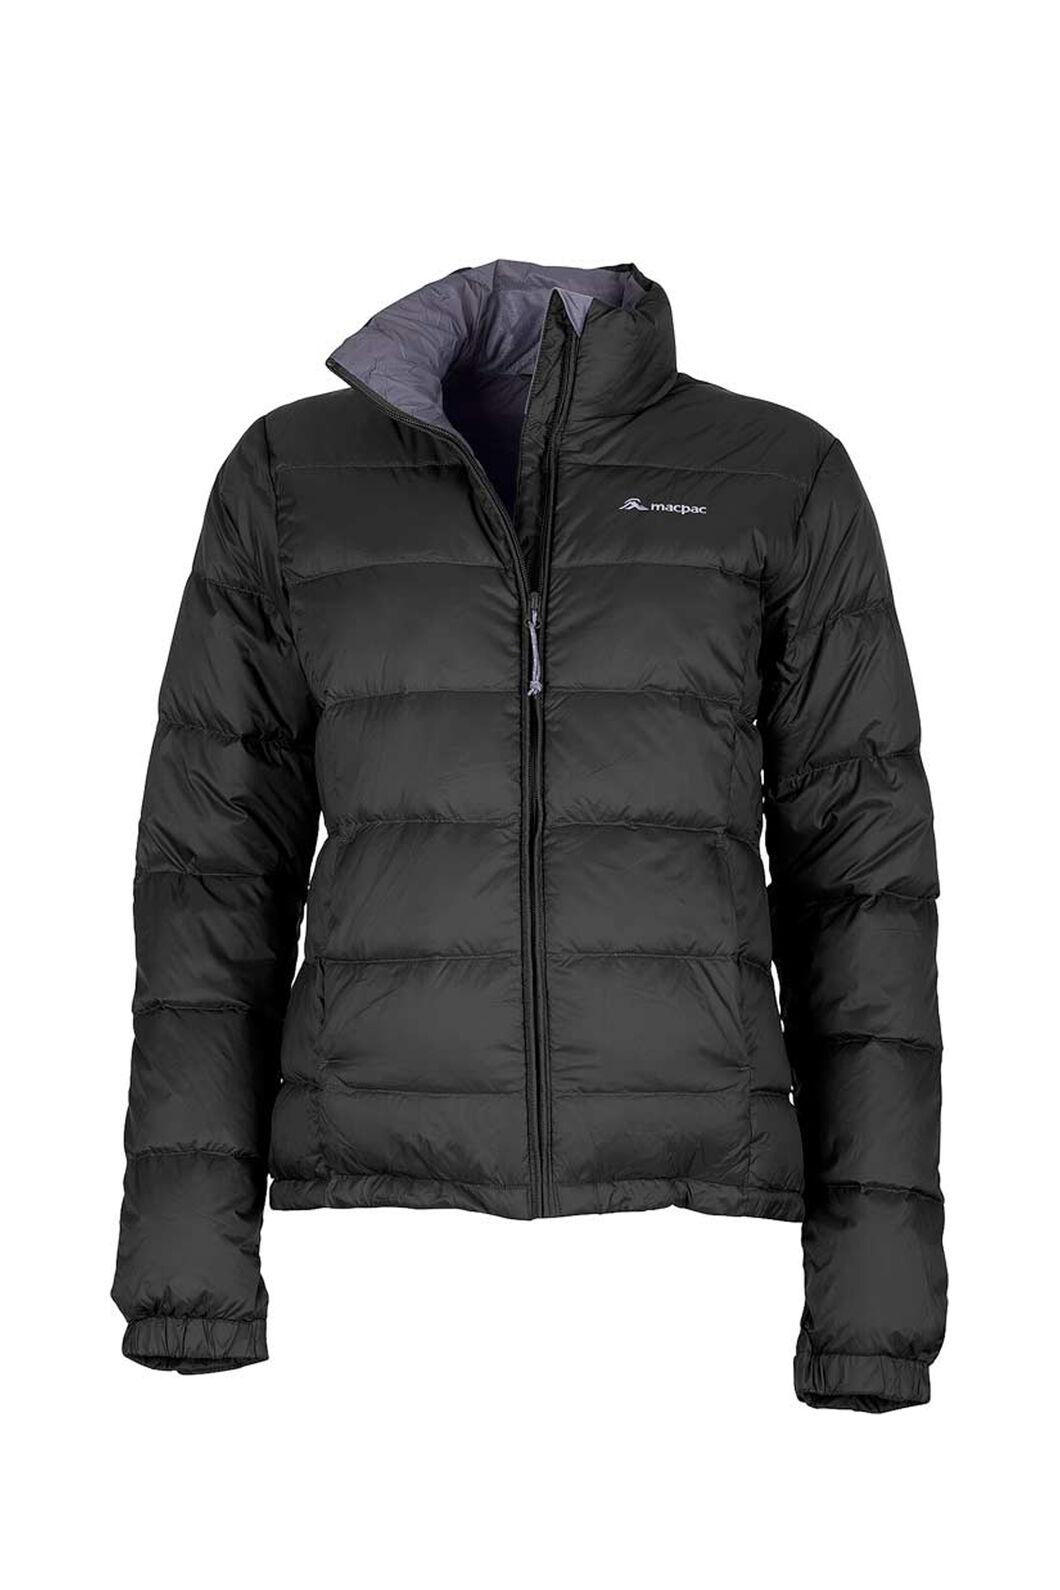 Macpac Halo Down Jacket — Women's, Black, hi-res